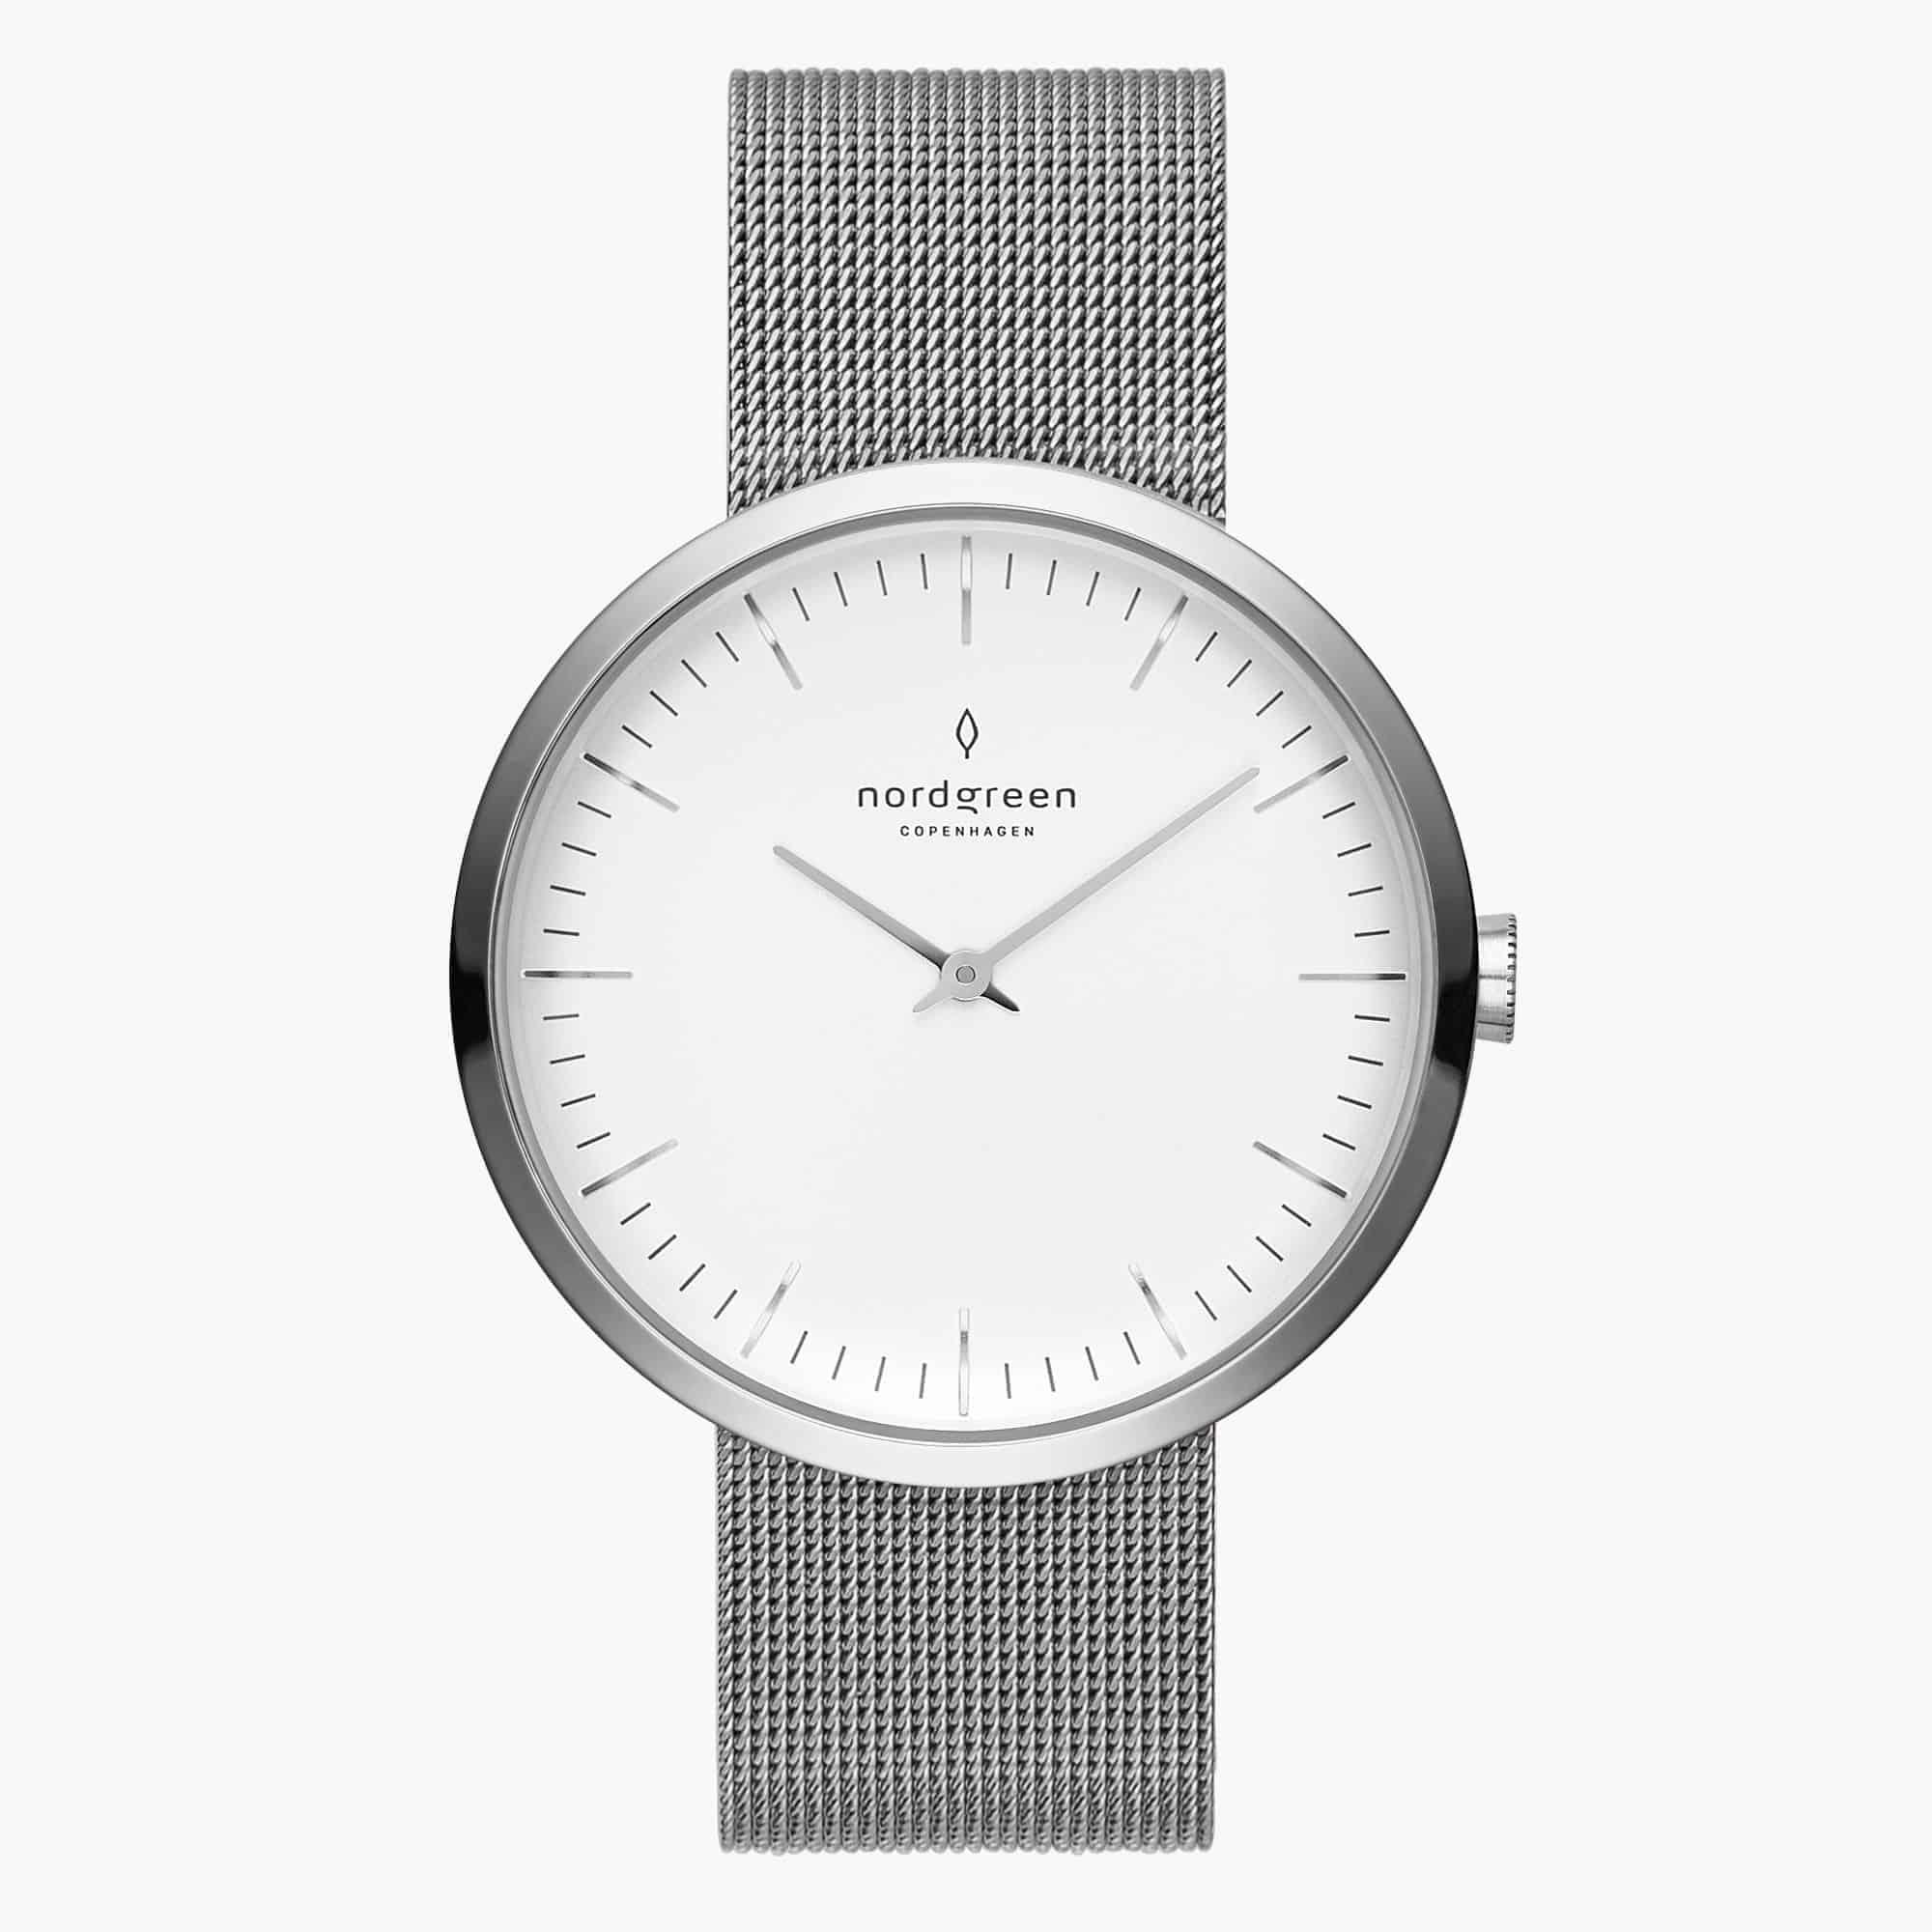 nordgreen wristwatch